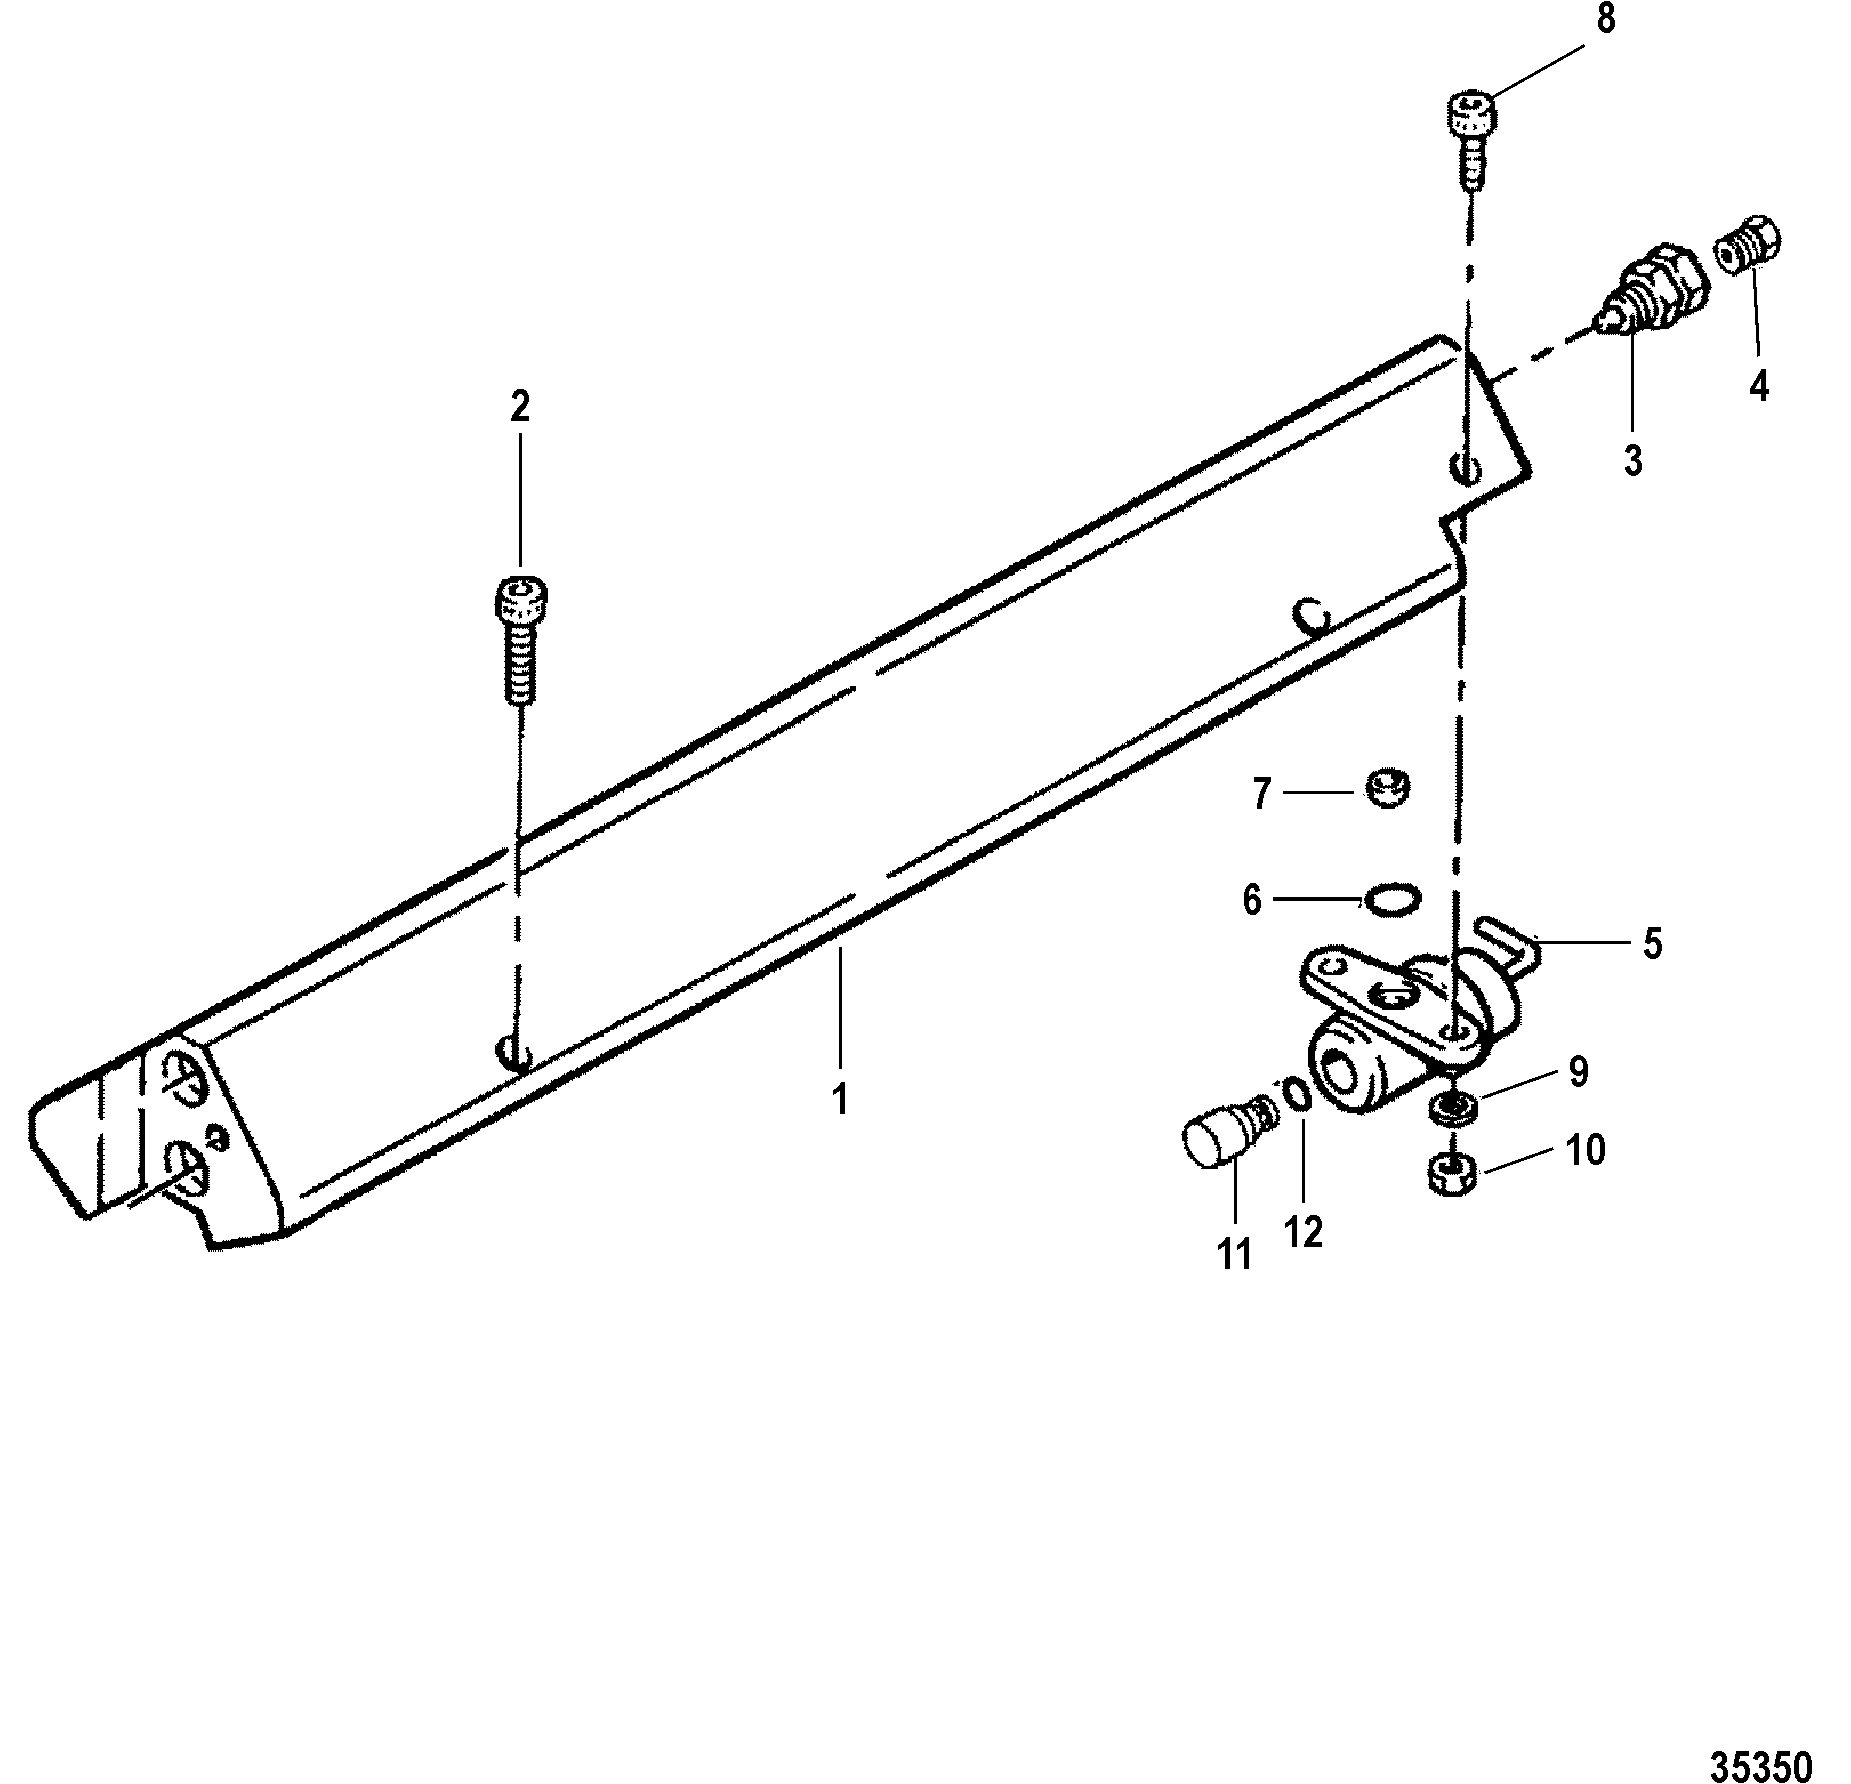 Fuel Rail Assembly For Mercruiser 454 502 Mpi Mag Bravo Gen Vi